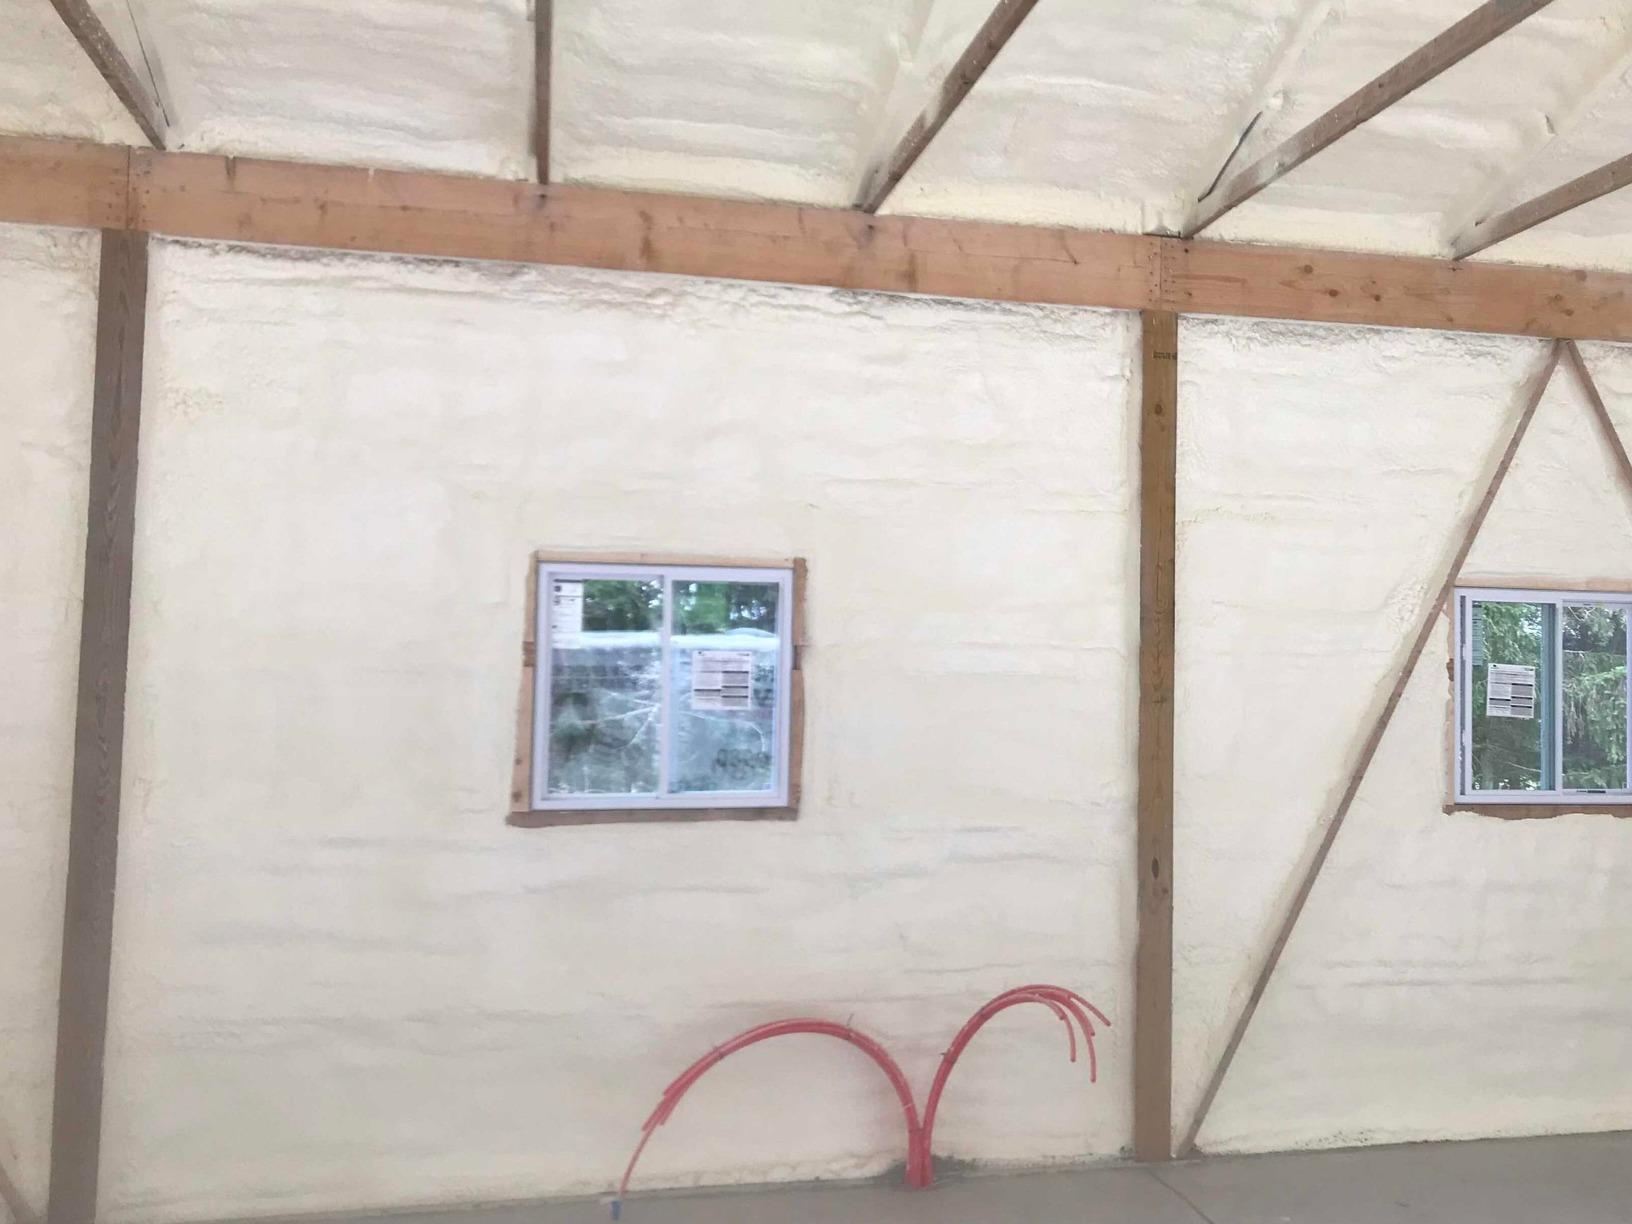 Pole Barn Insulation- Newfoundland Pa - After Photo